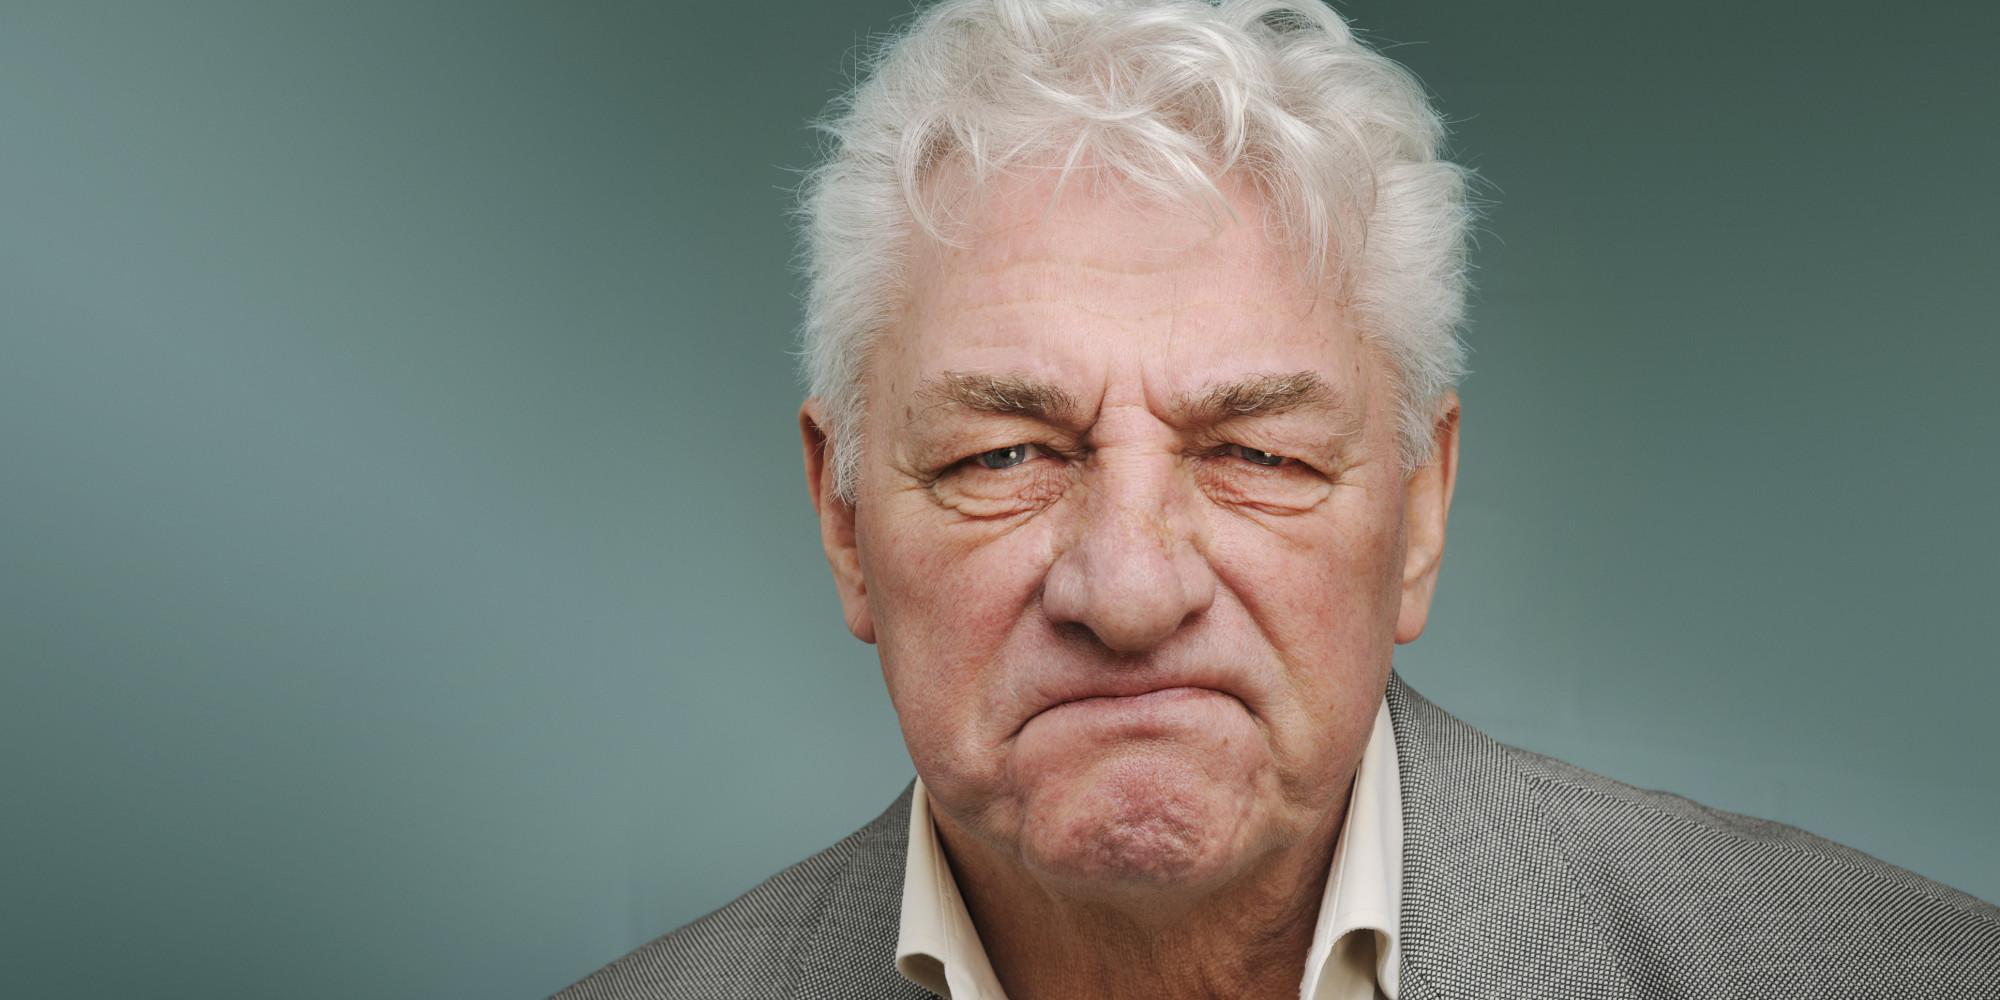 Old Man Fuck Tube plus Old Man Brunette Double Penetration xhamster porn